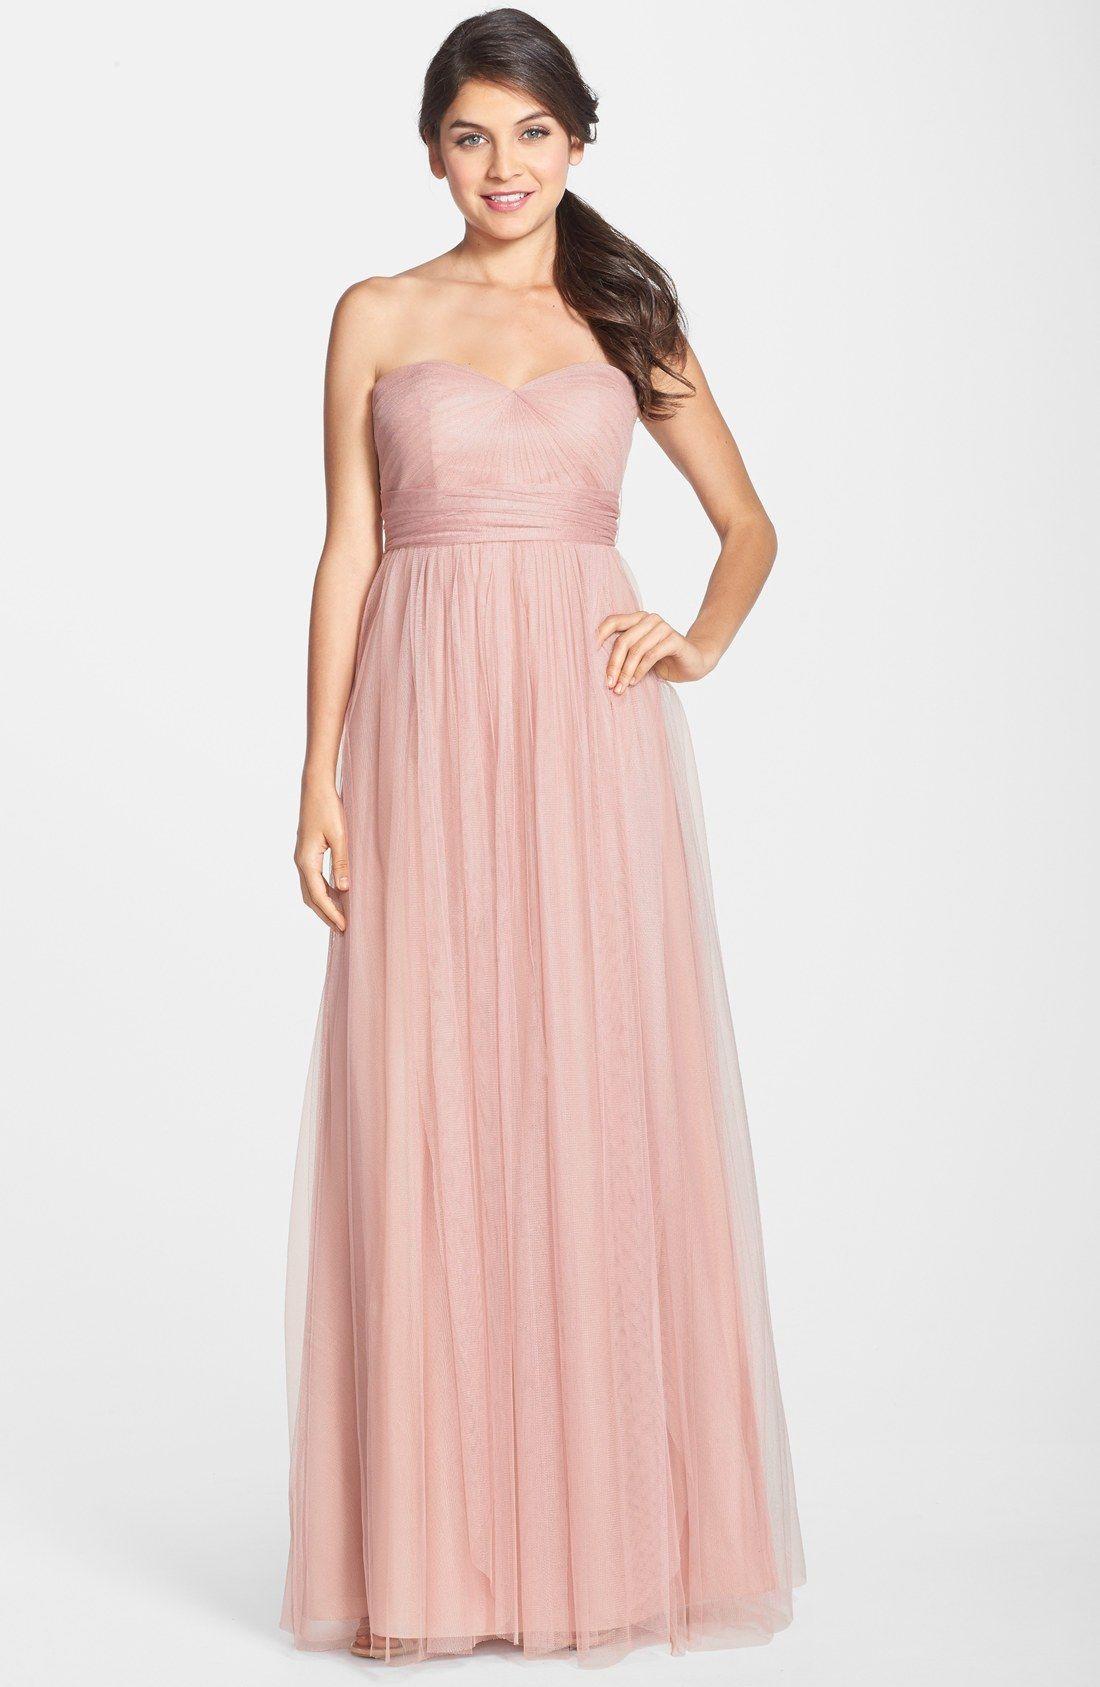 3b122e5e7a27d Jenny Yoo 'Annabelle' Convertible Tulle Column Dress   Nordstrom ...